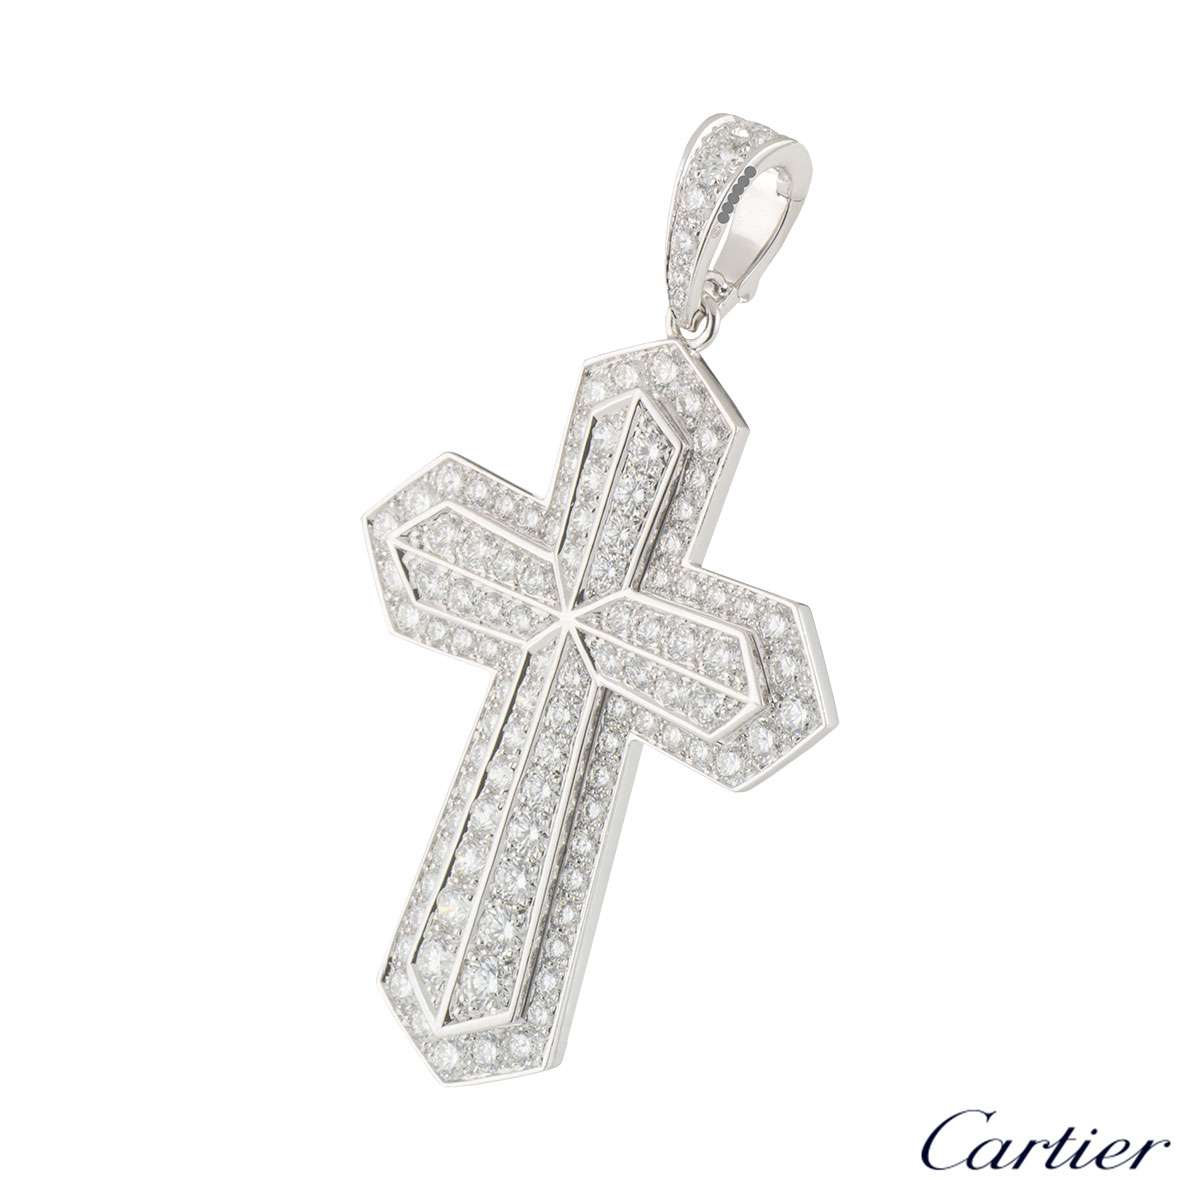 Cartier White Gold Diamond Cross Pendant